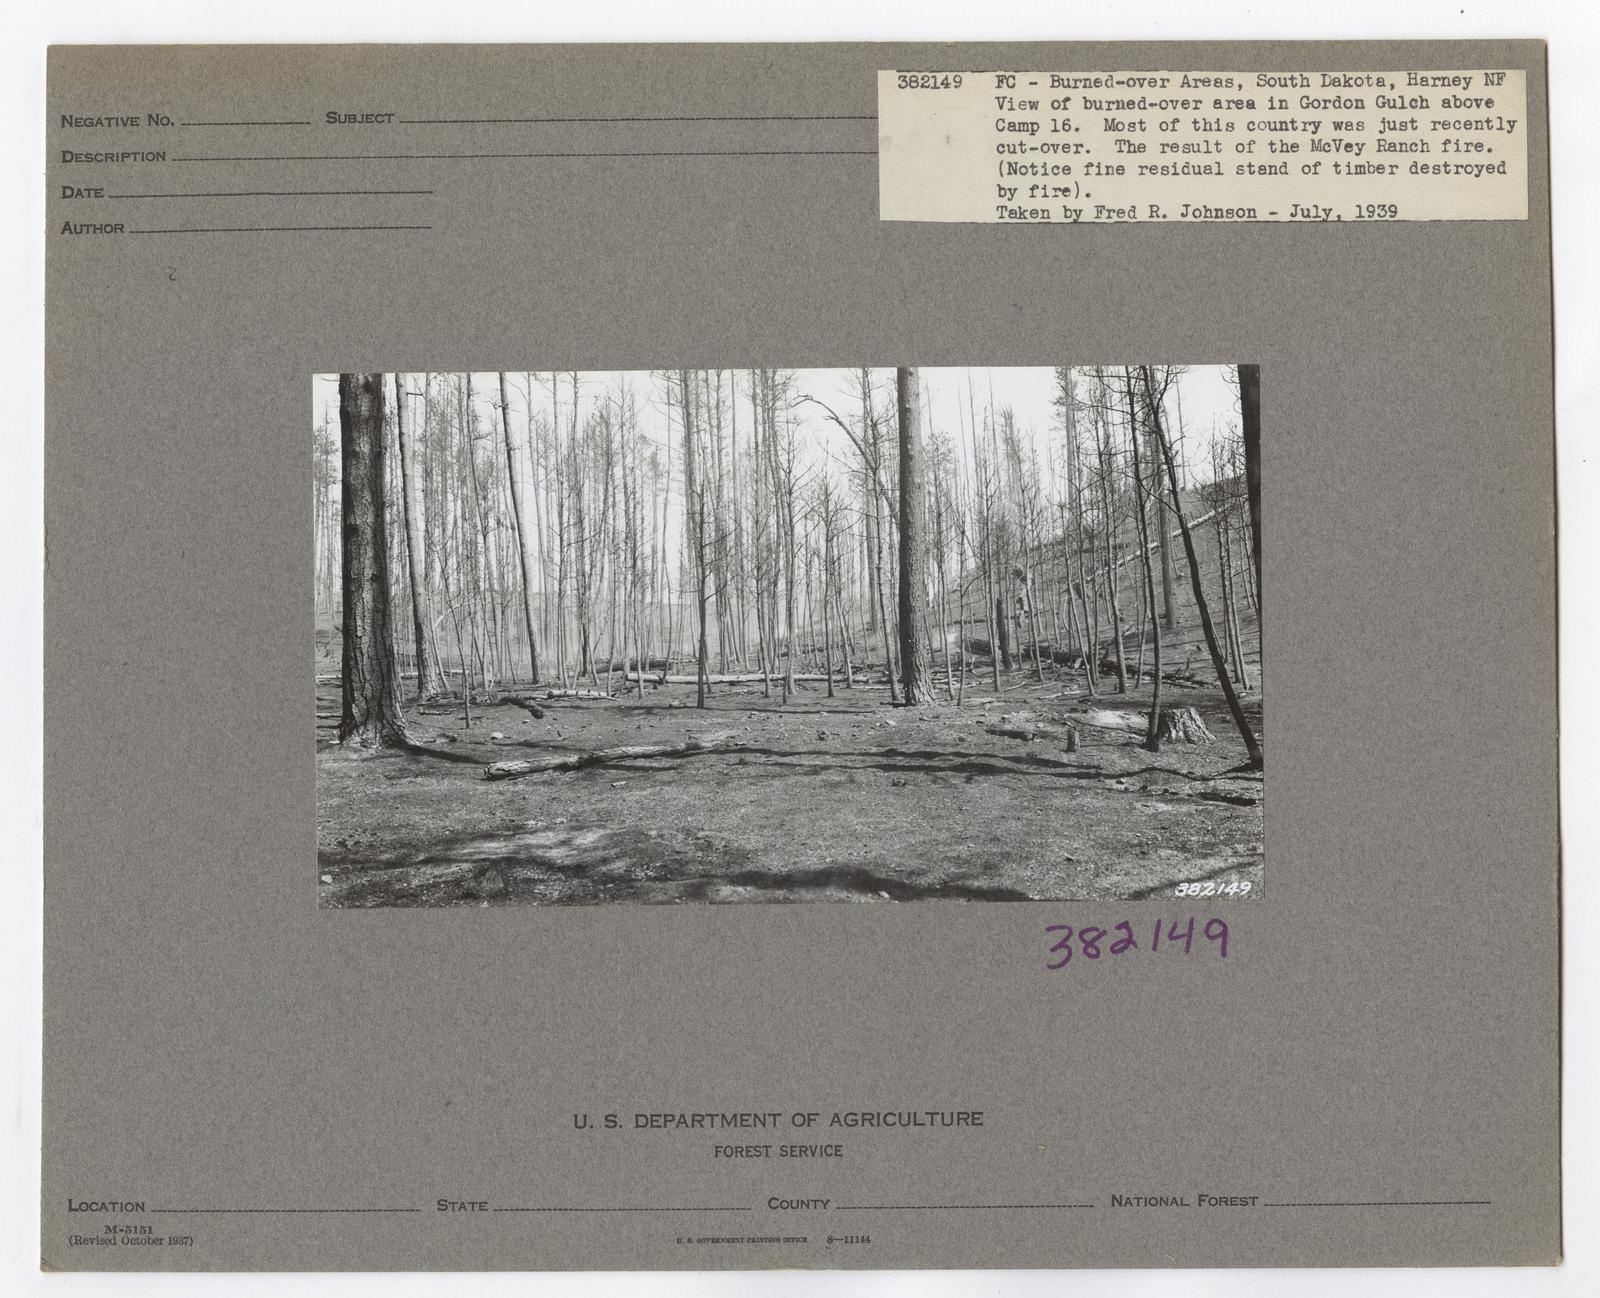 Burned -Over Areas - South Dakota